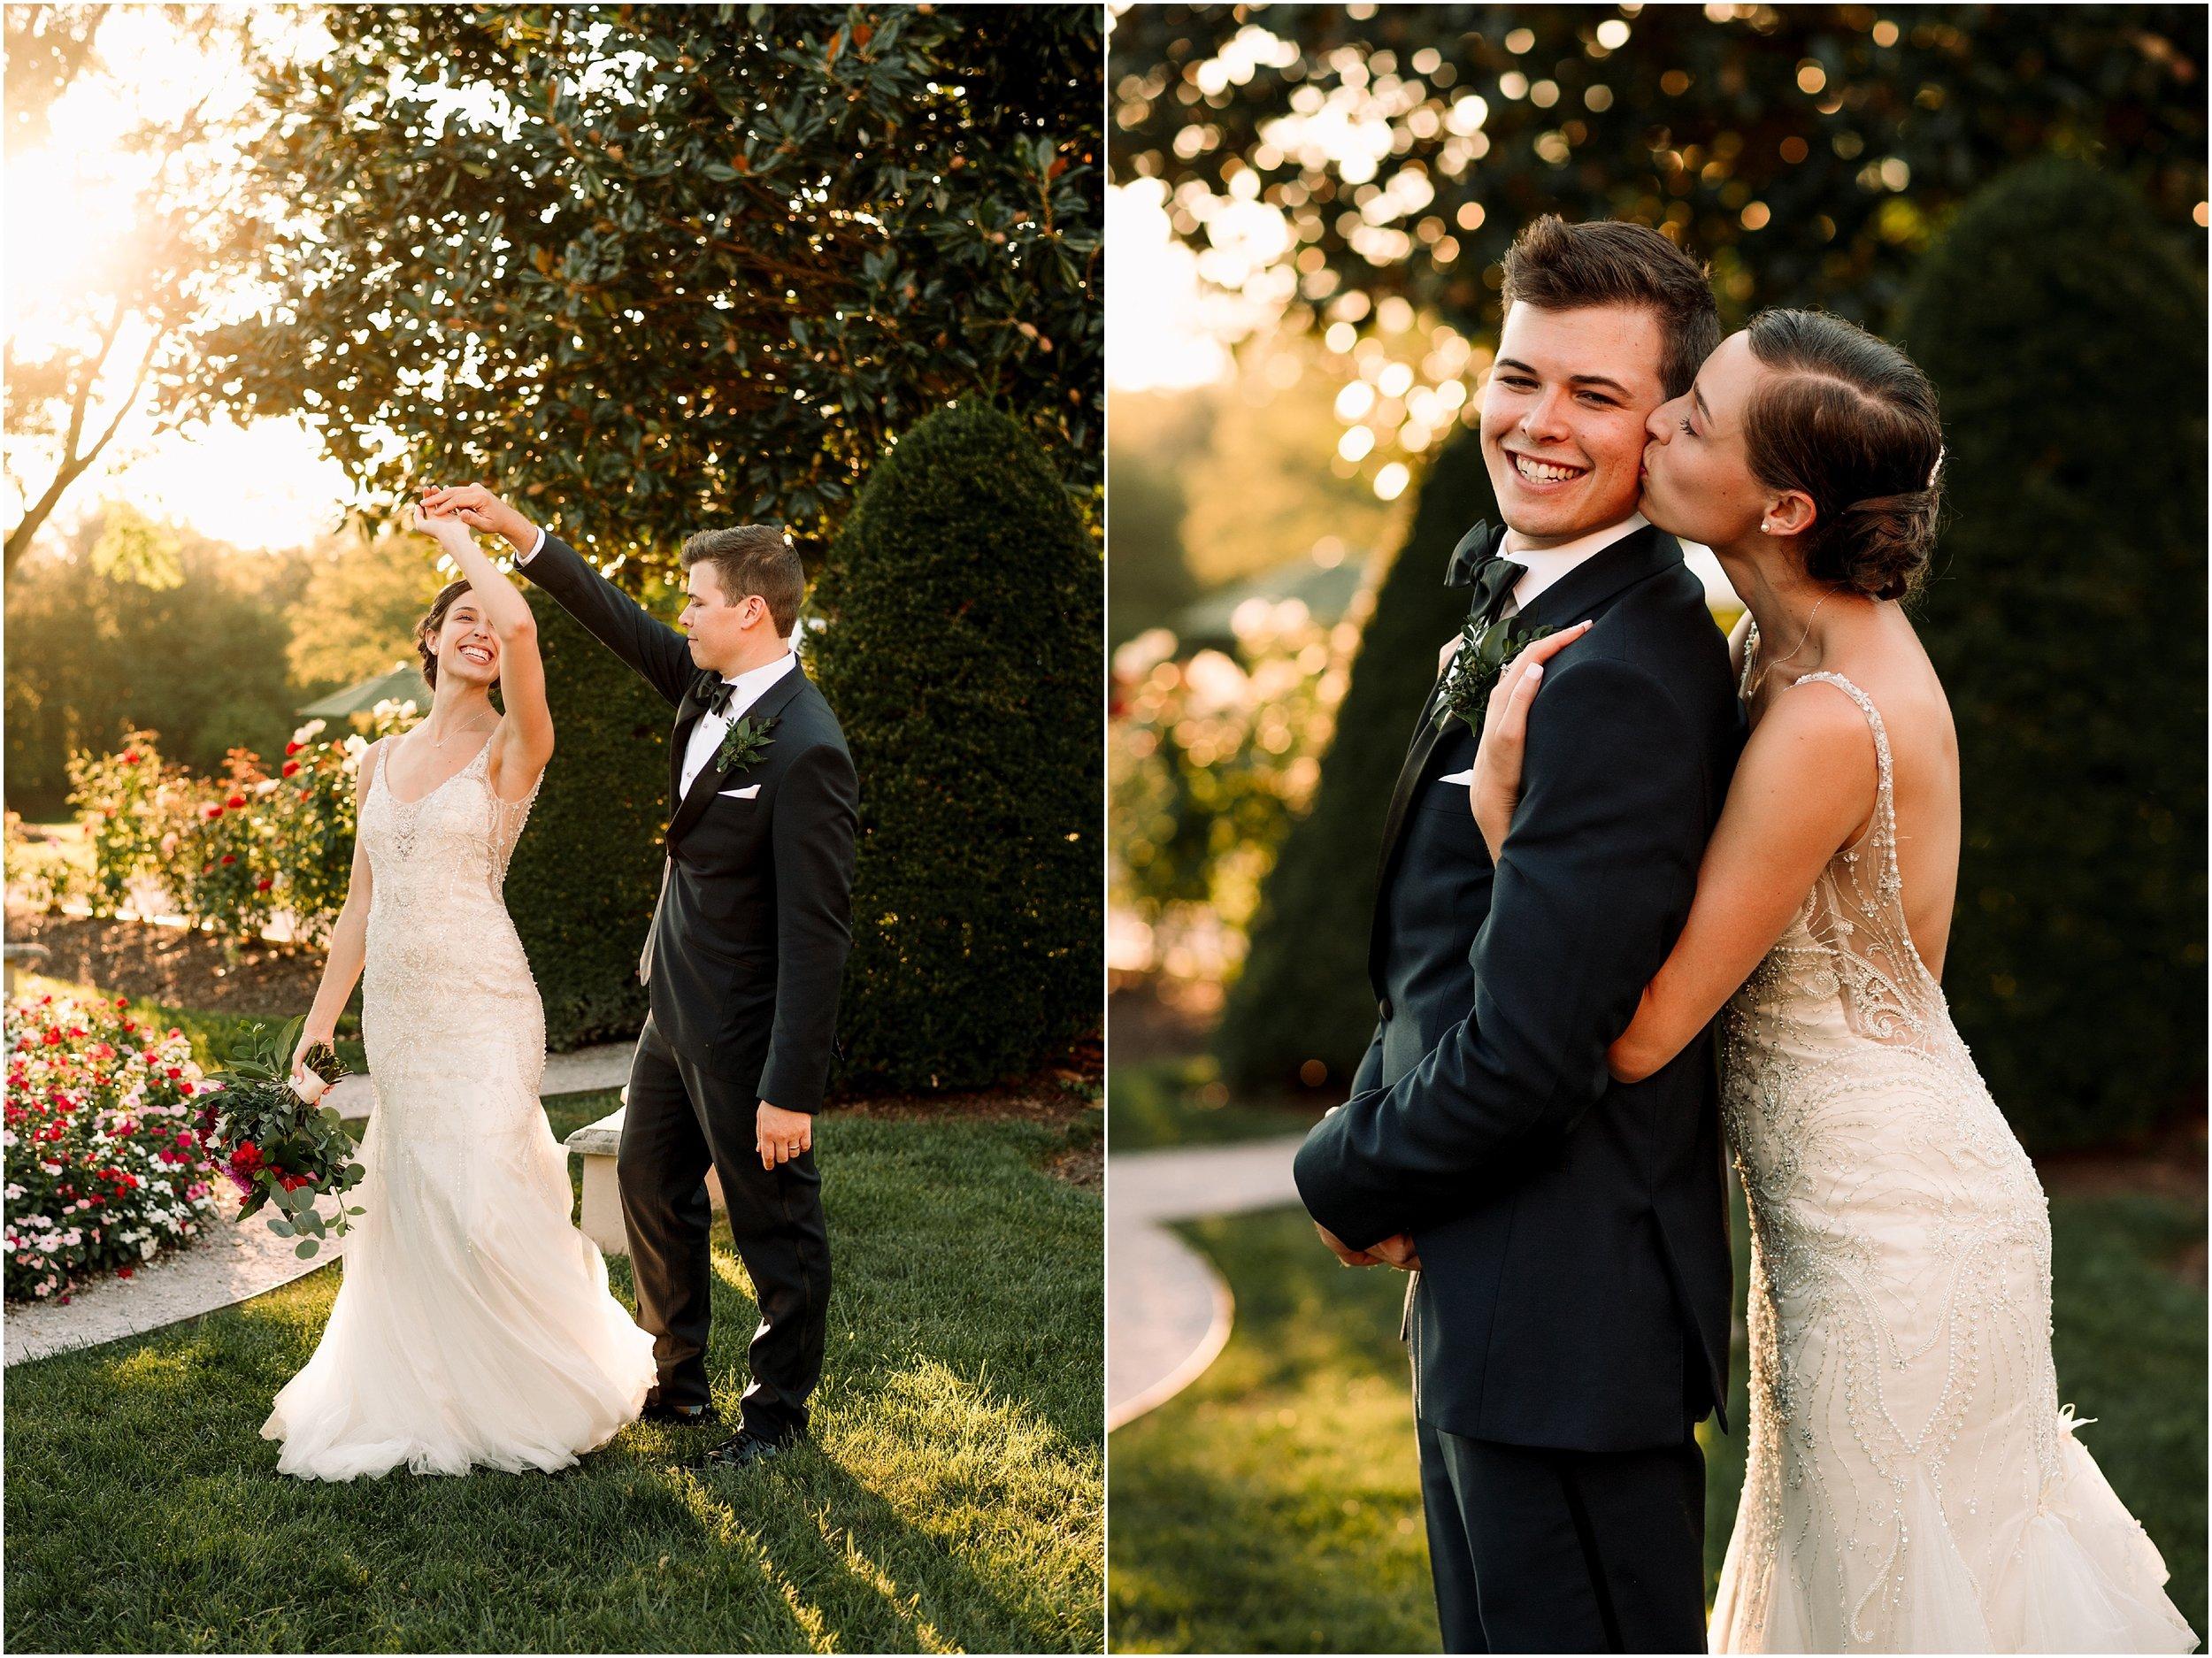 hannah leigh photography Antrim 1844 Wedding_1249.jpg